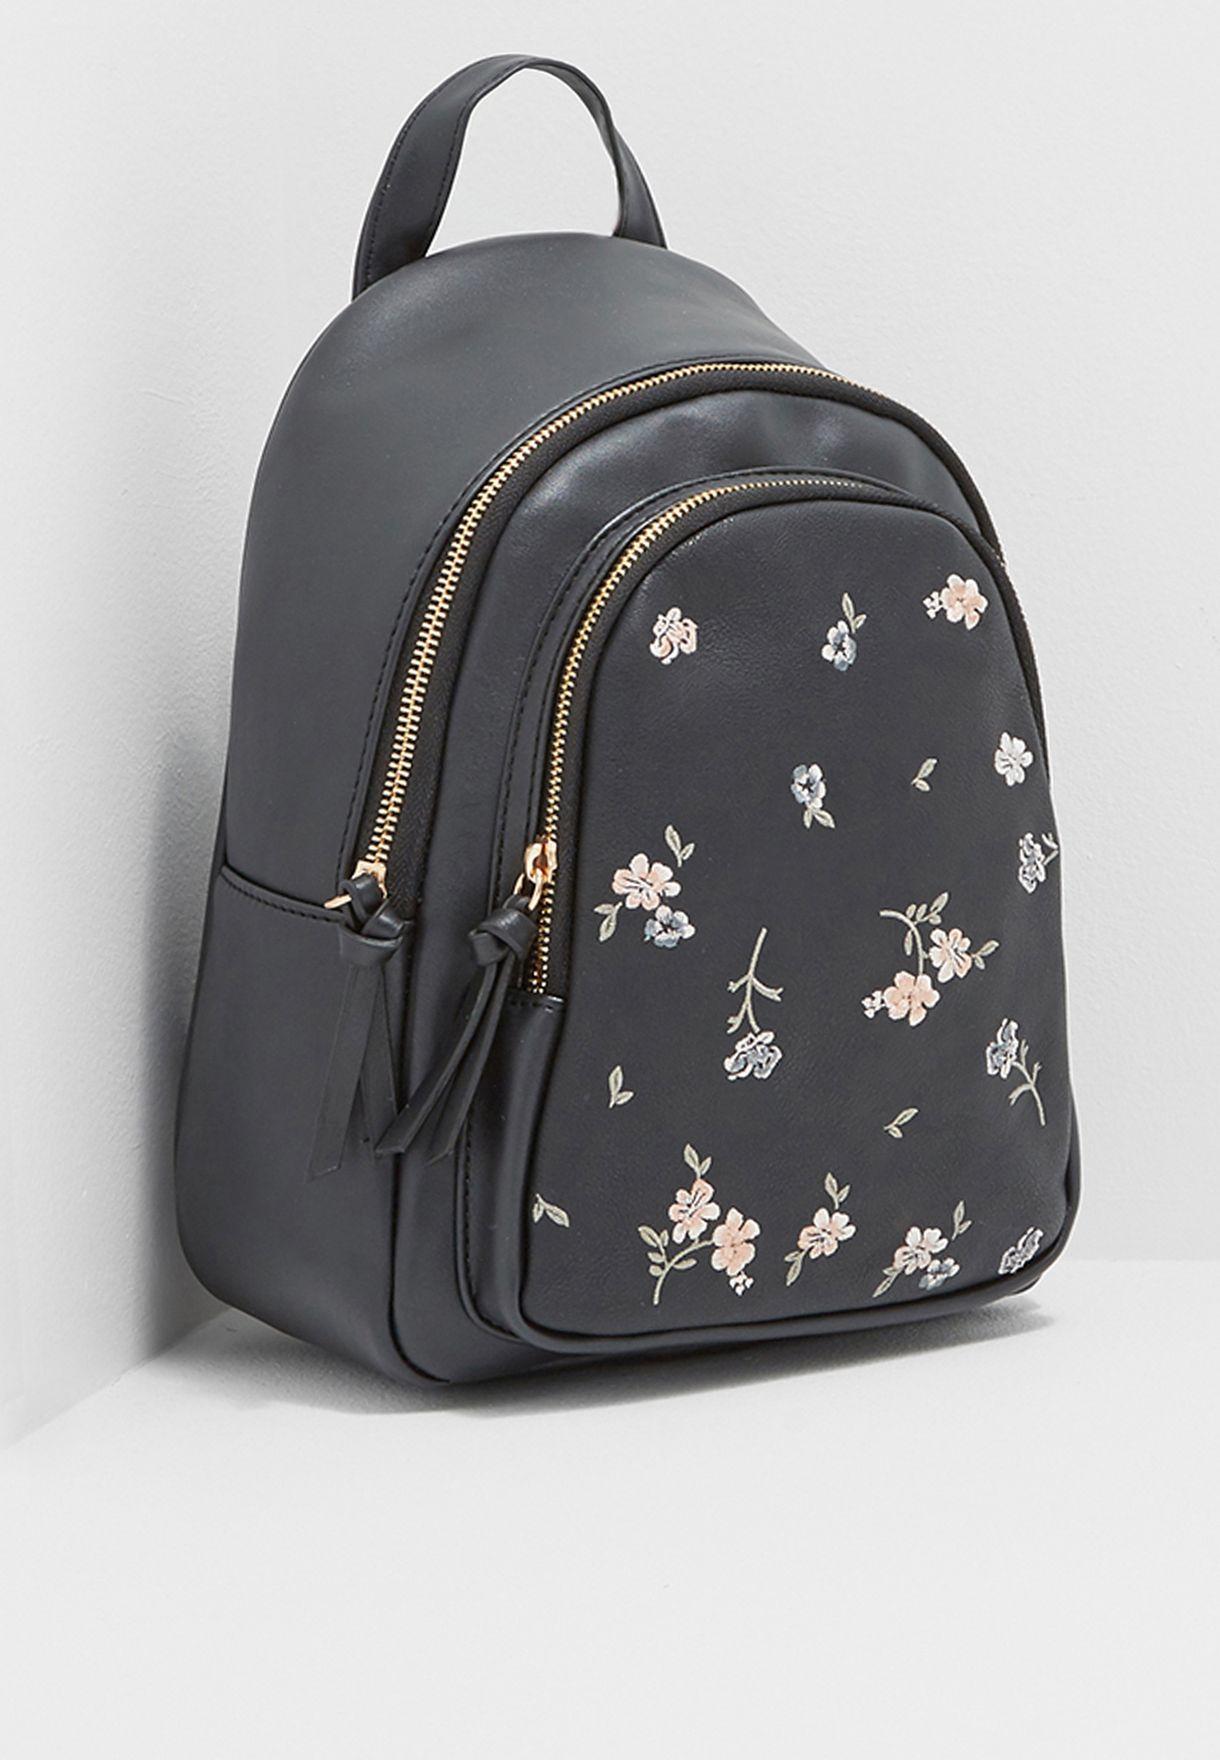 d6d8904c9467 Shop New Look black Mini Frances Floral Embroidered Backpack ...